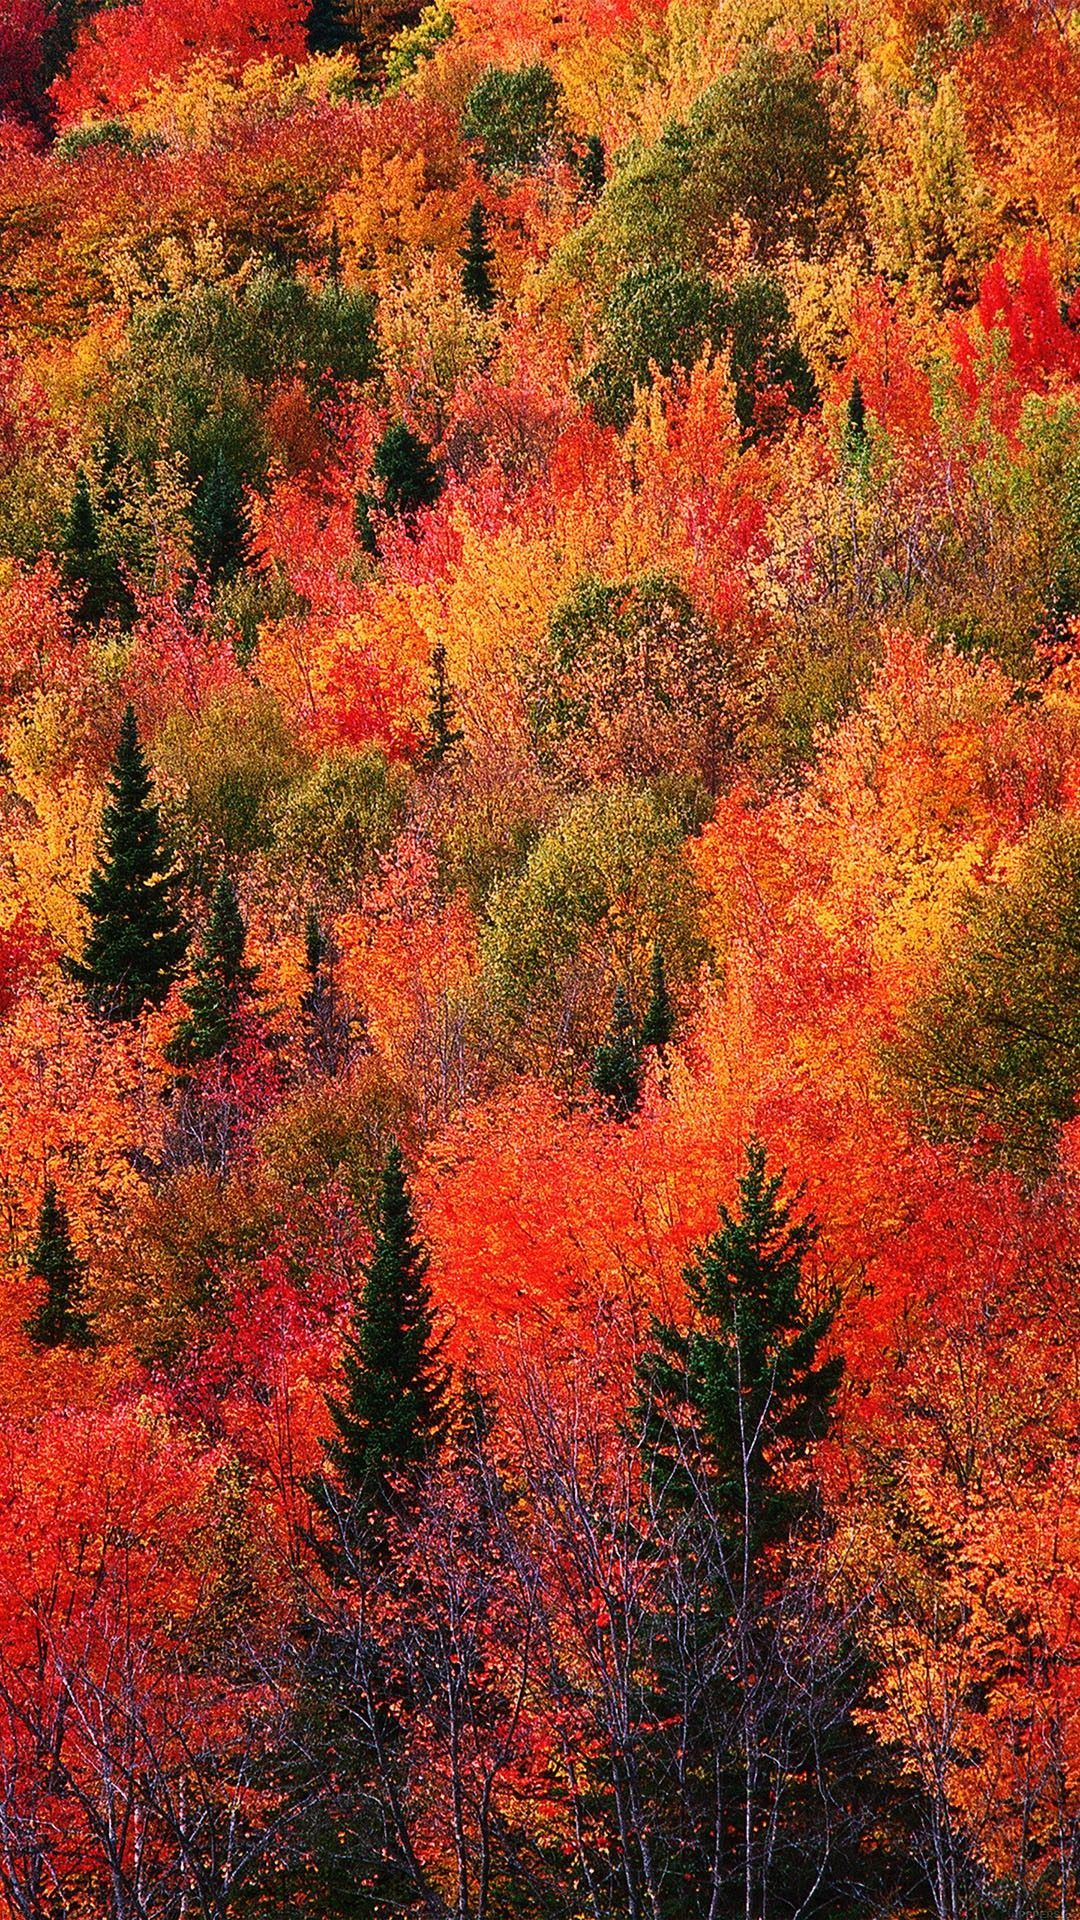 Autumn Phone 4k Hd Wallpapers Wallpaper Cave